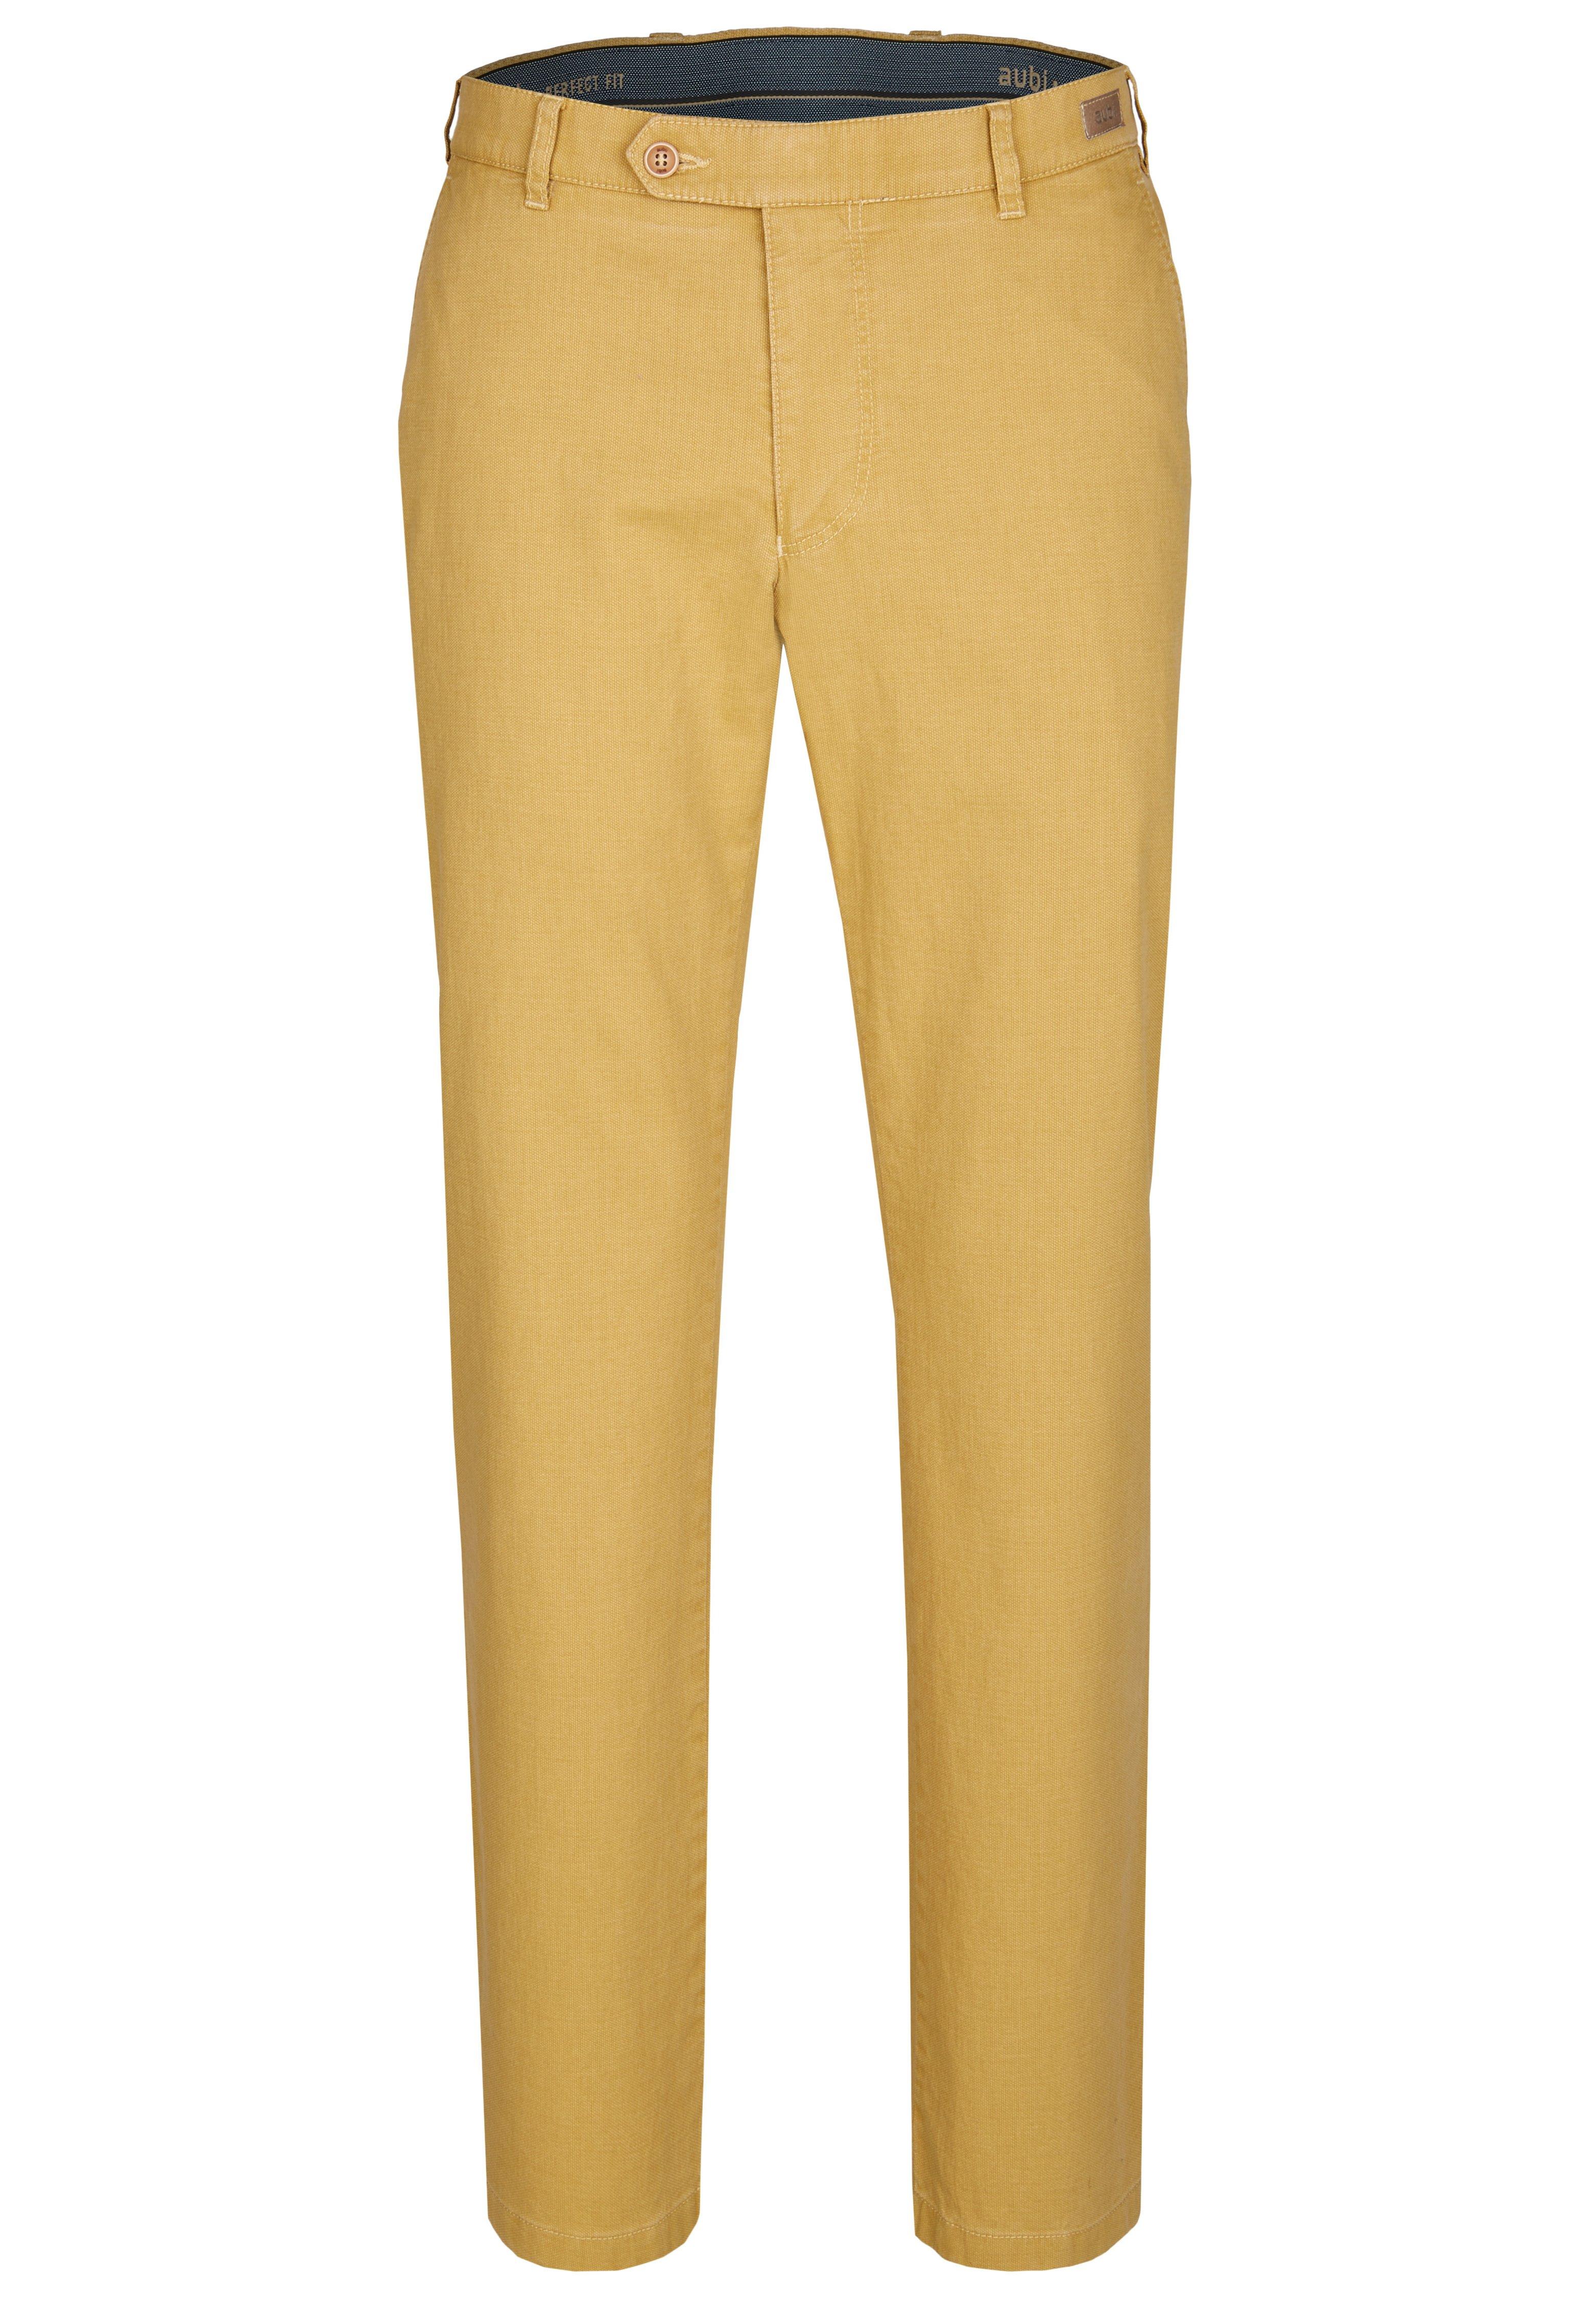 Herren Stoffhose - gelb